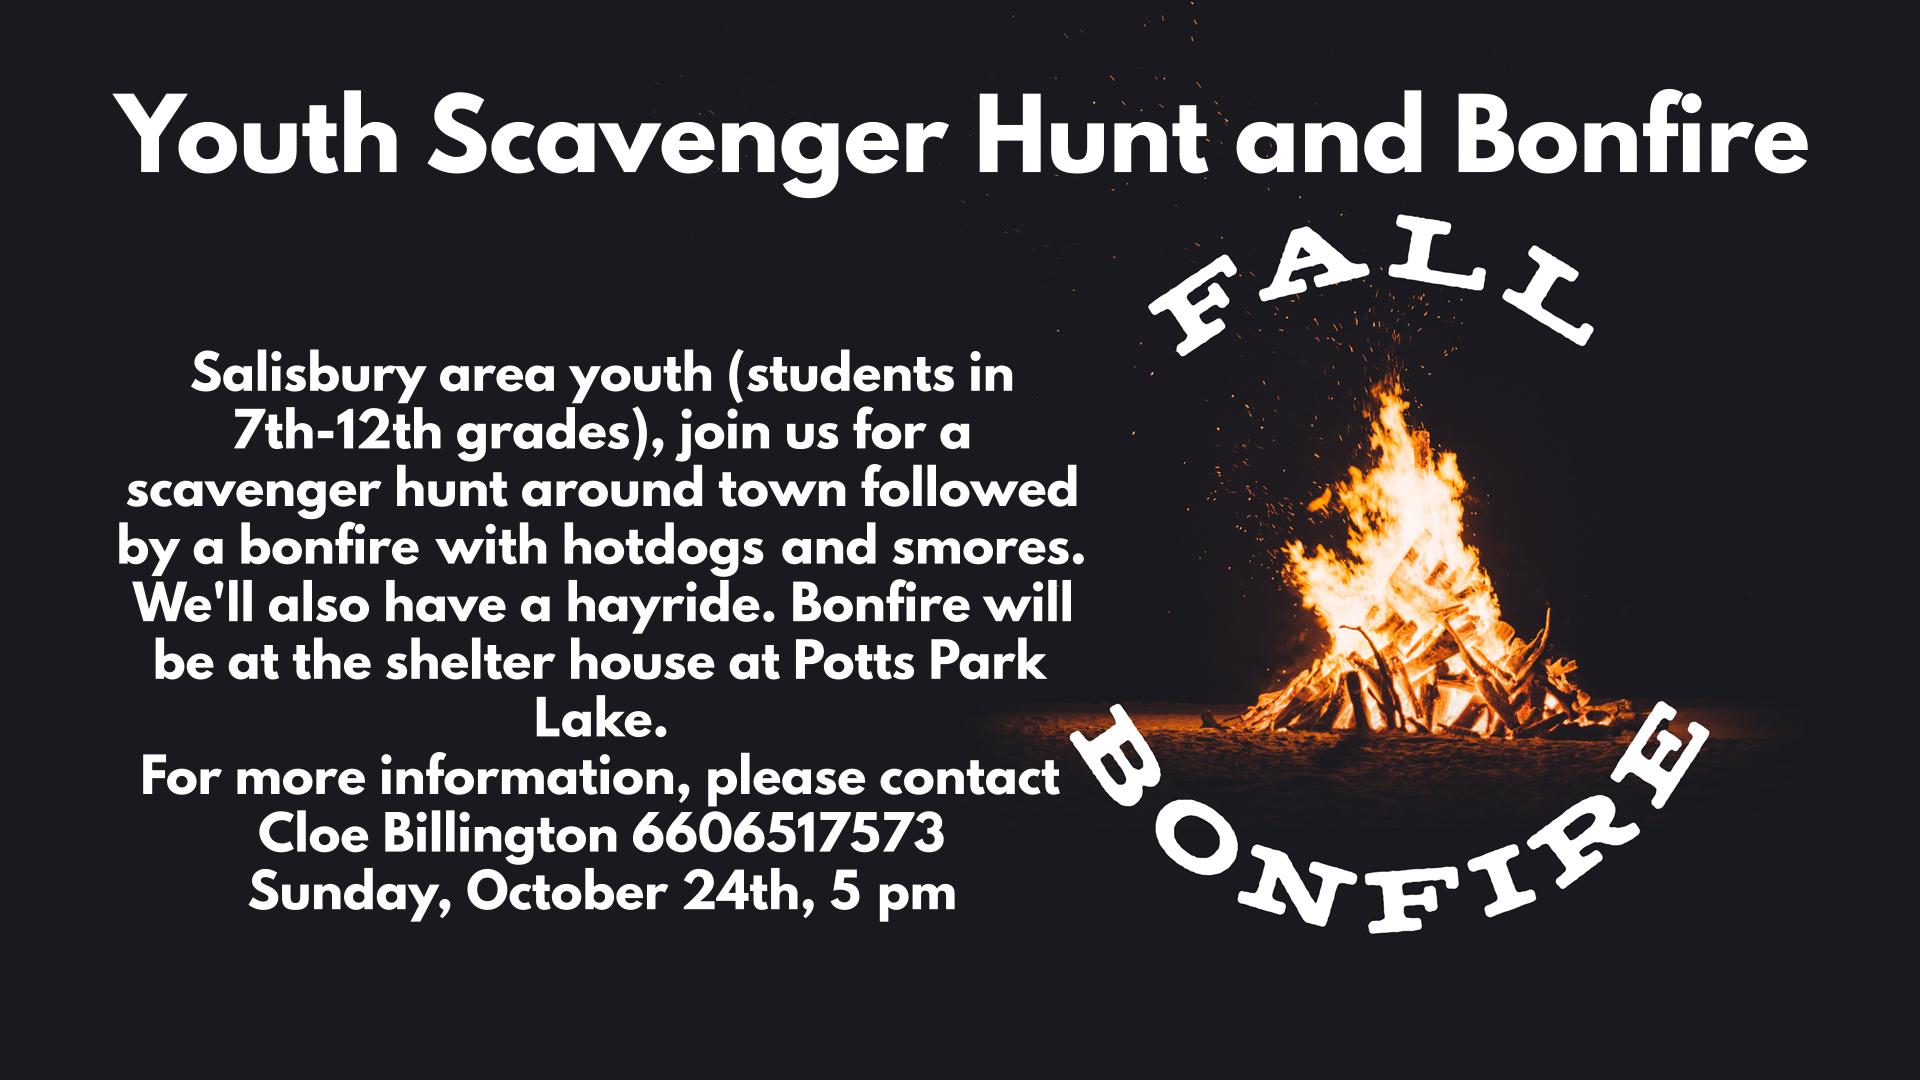 Youth Scavenger Hunt and Bonfire